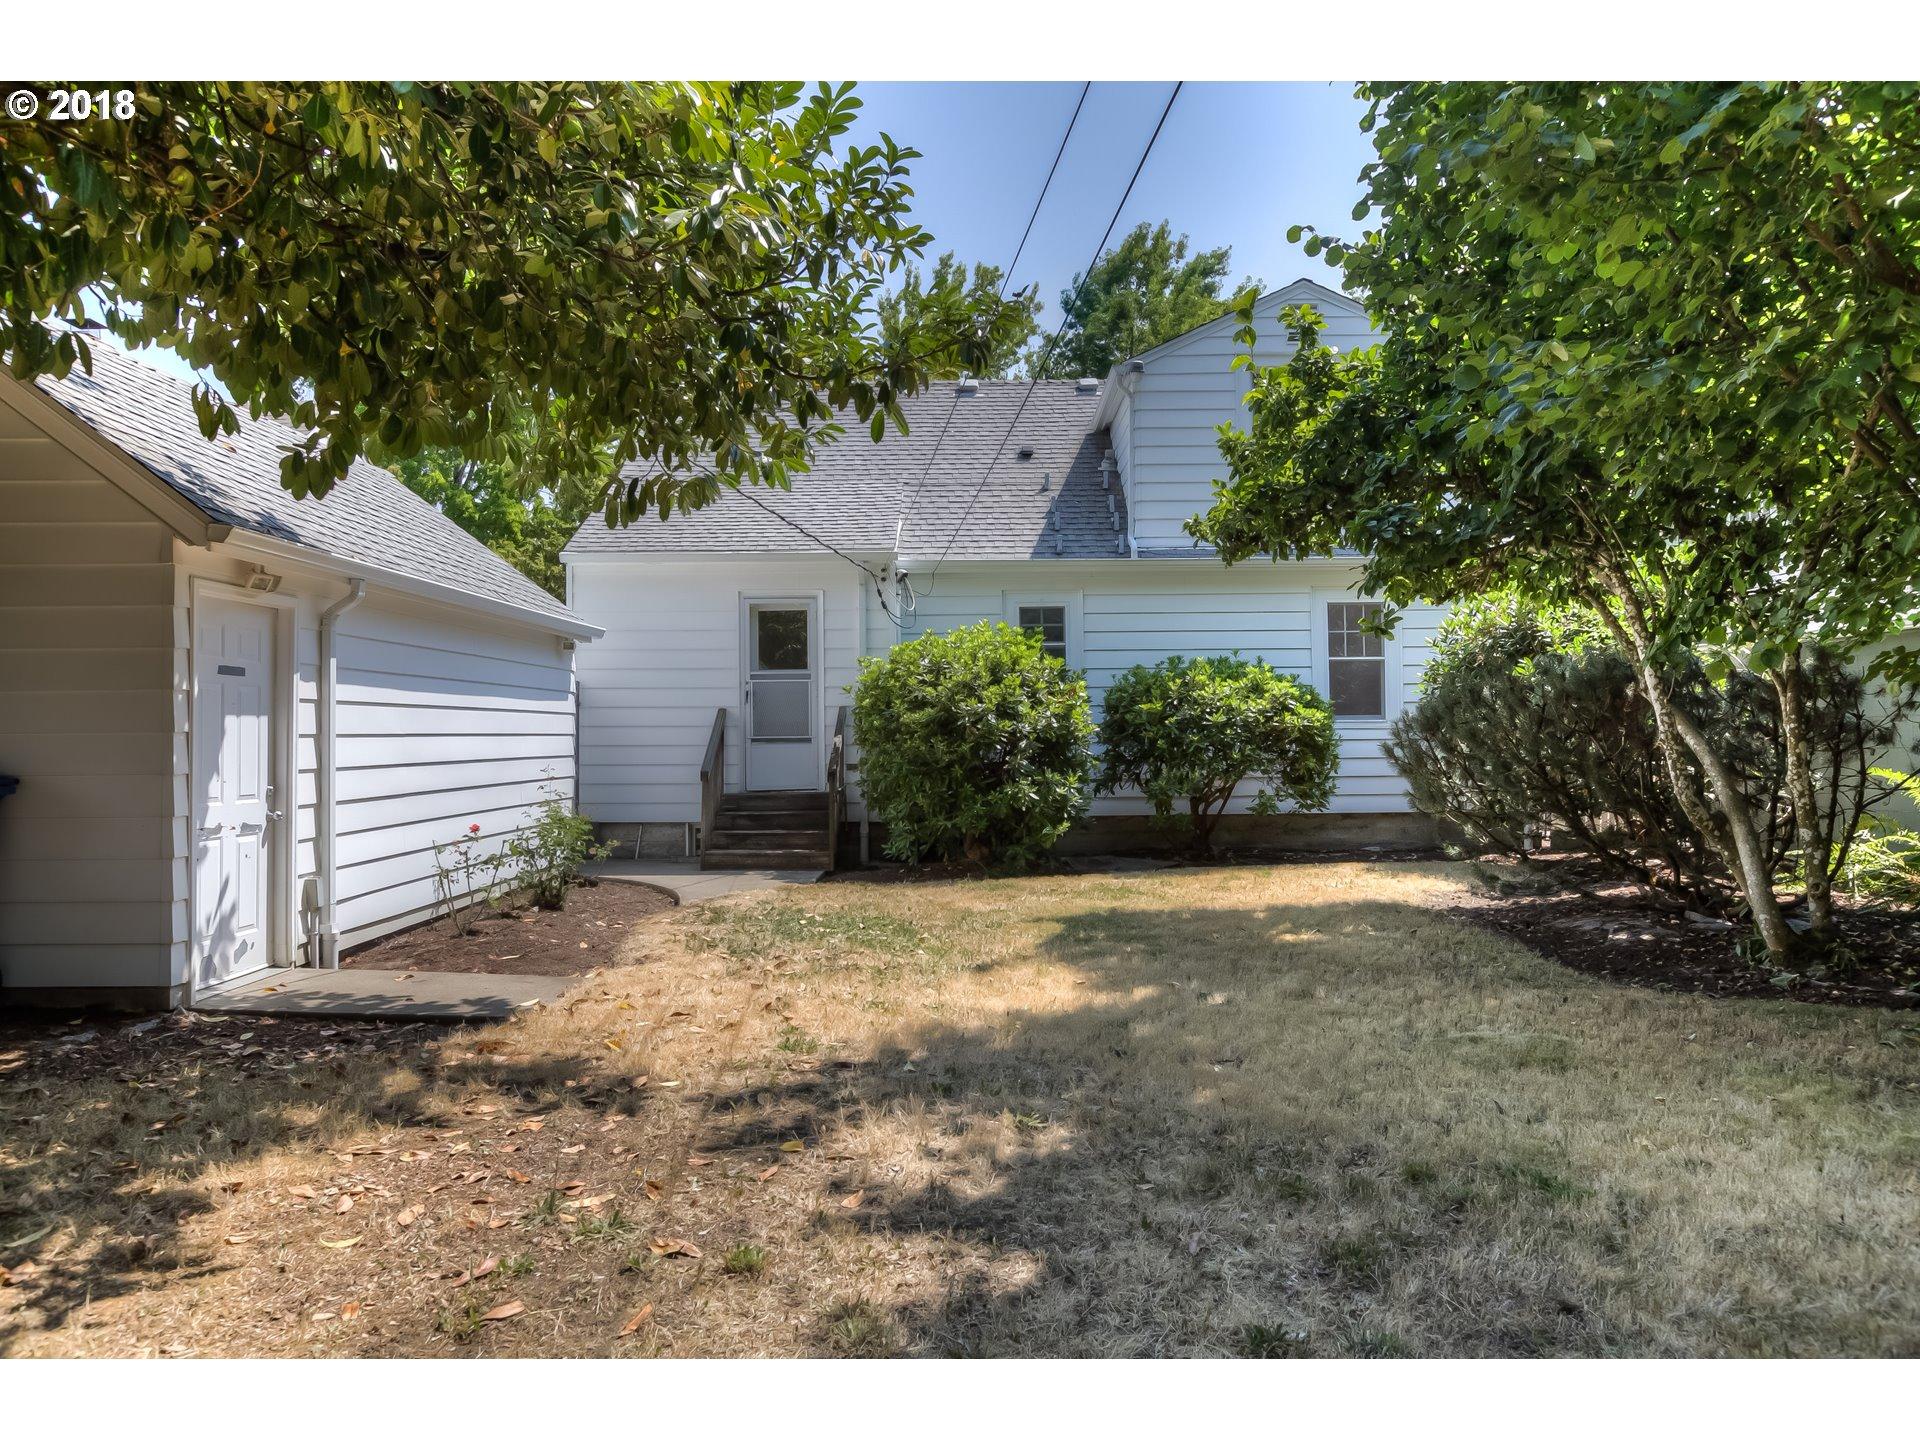 1555 19TH ST Salem, OR 97301 - MLS #: 18636372